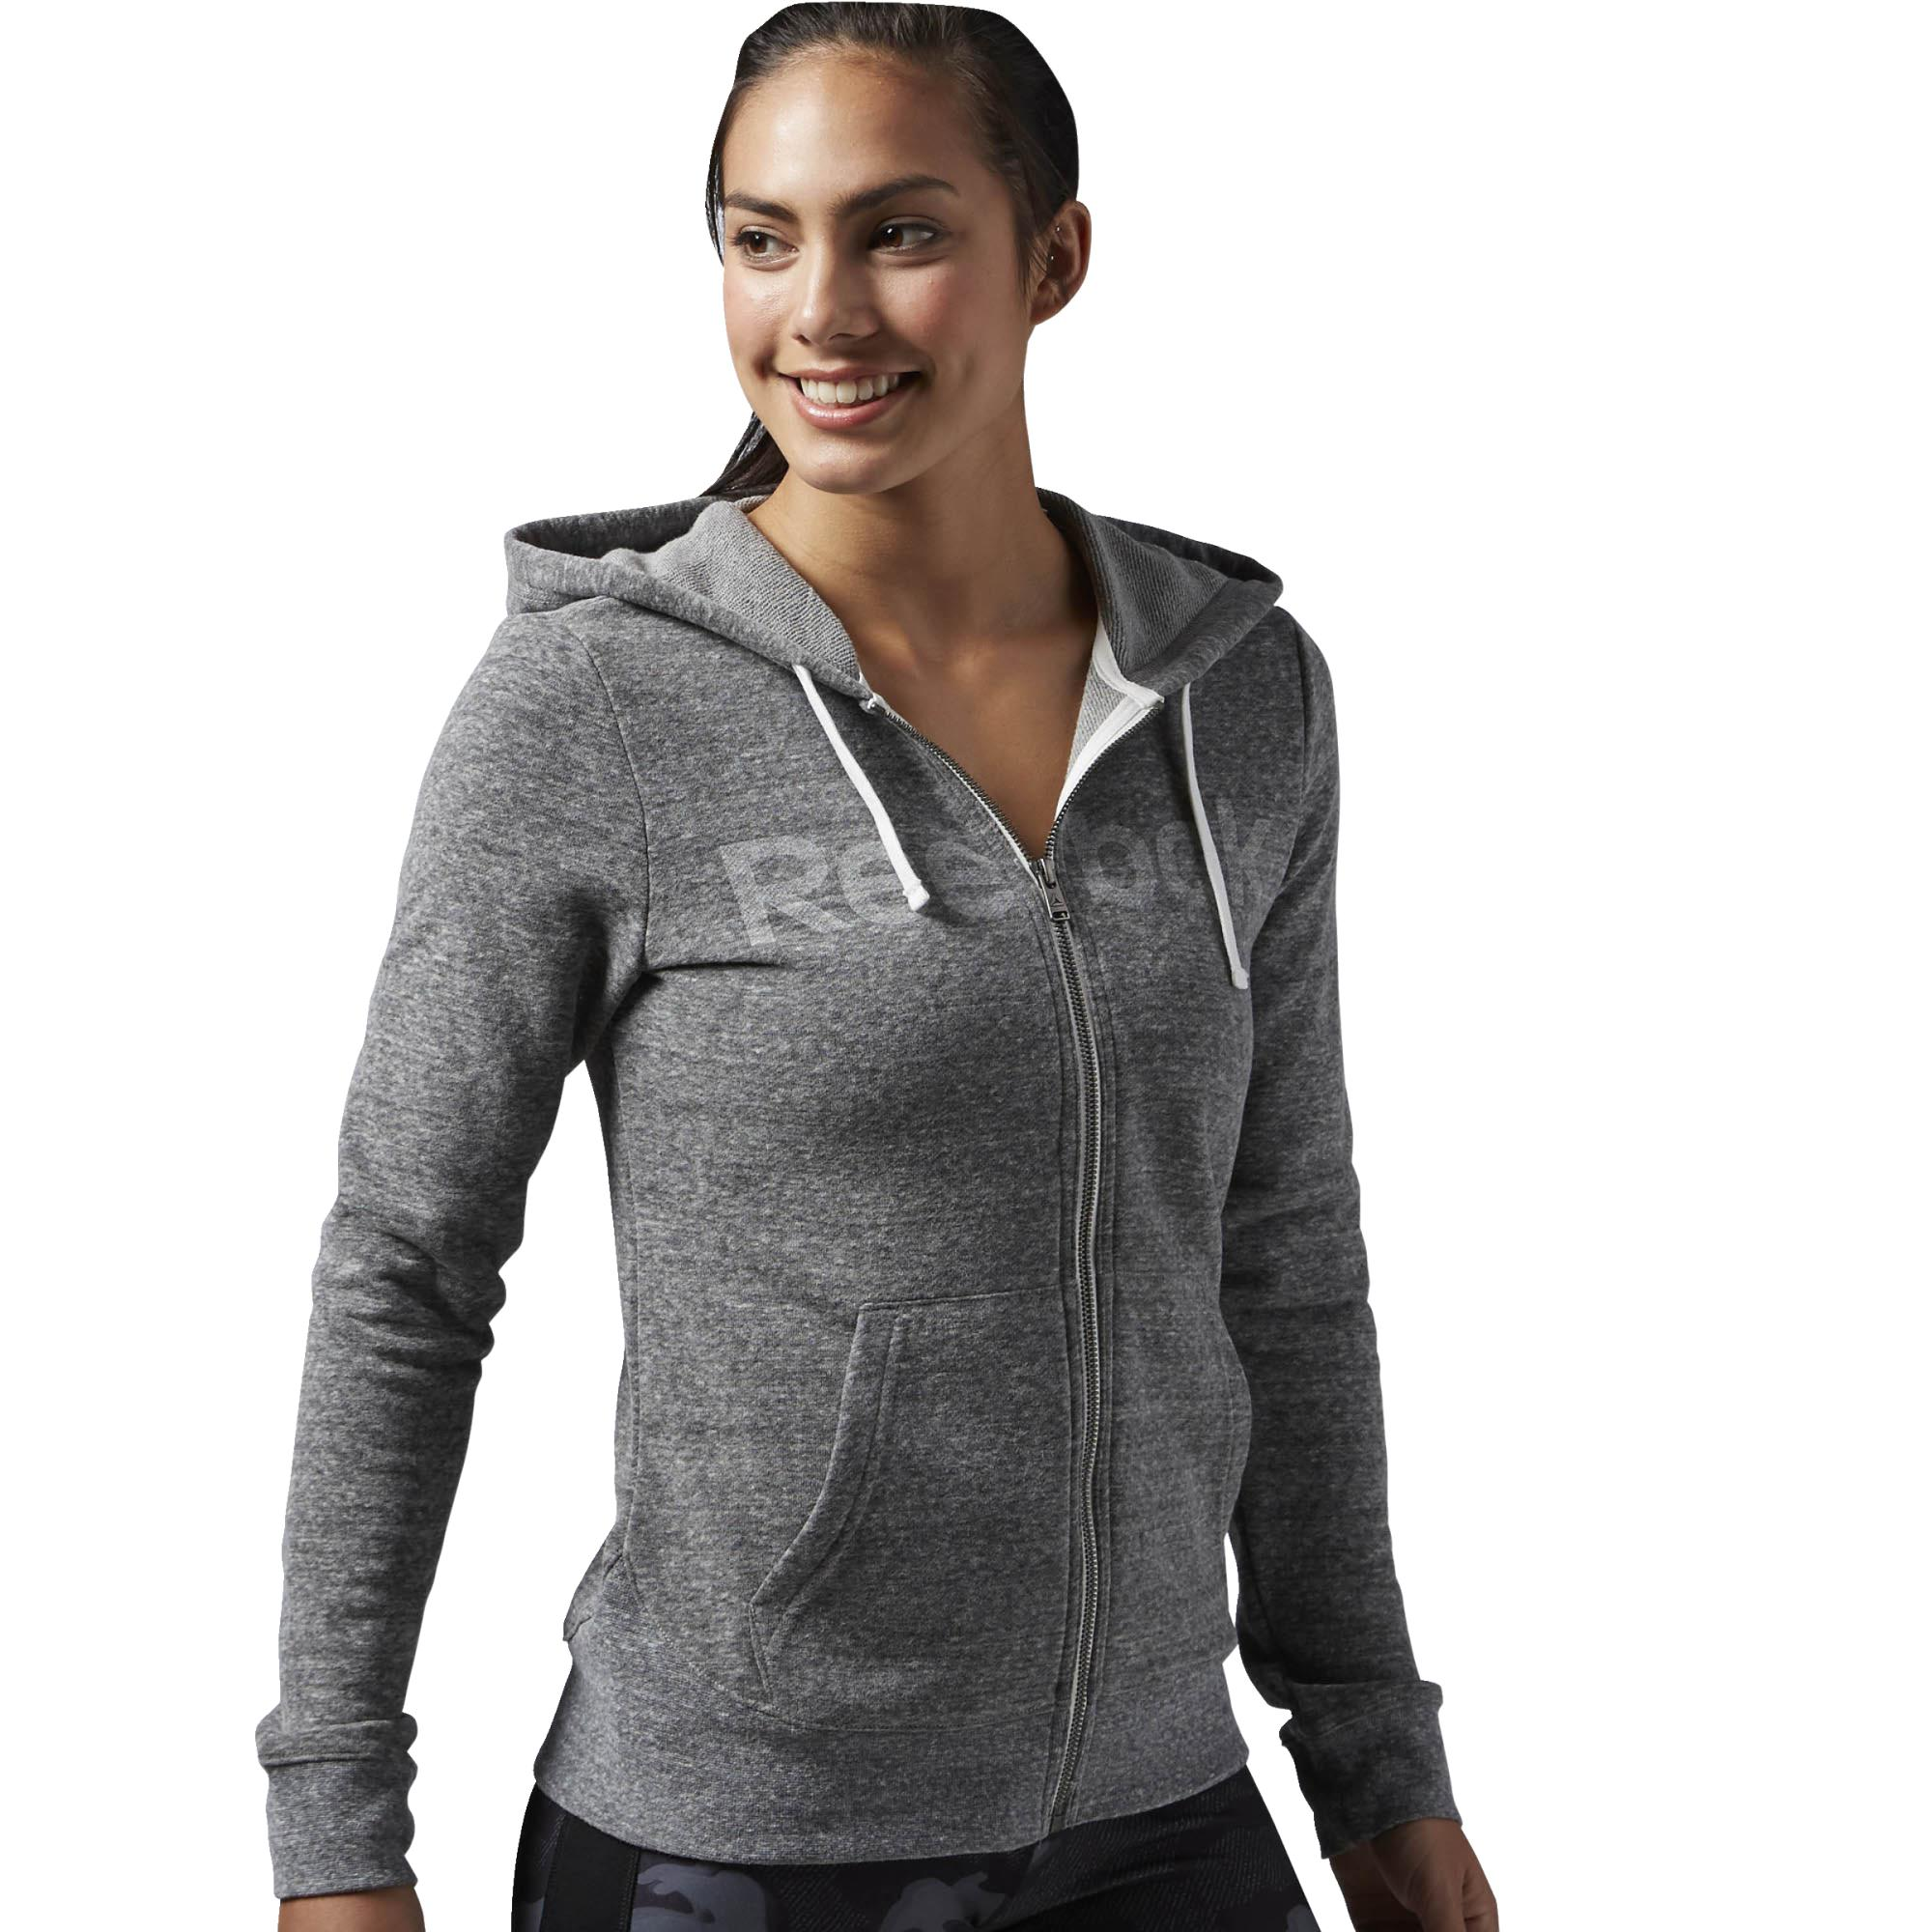 gran descuento 32e71 b76e4 Reebok Mujer Sudadera Elements Big Logo Fitness Full-ZIp (gris)